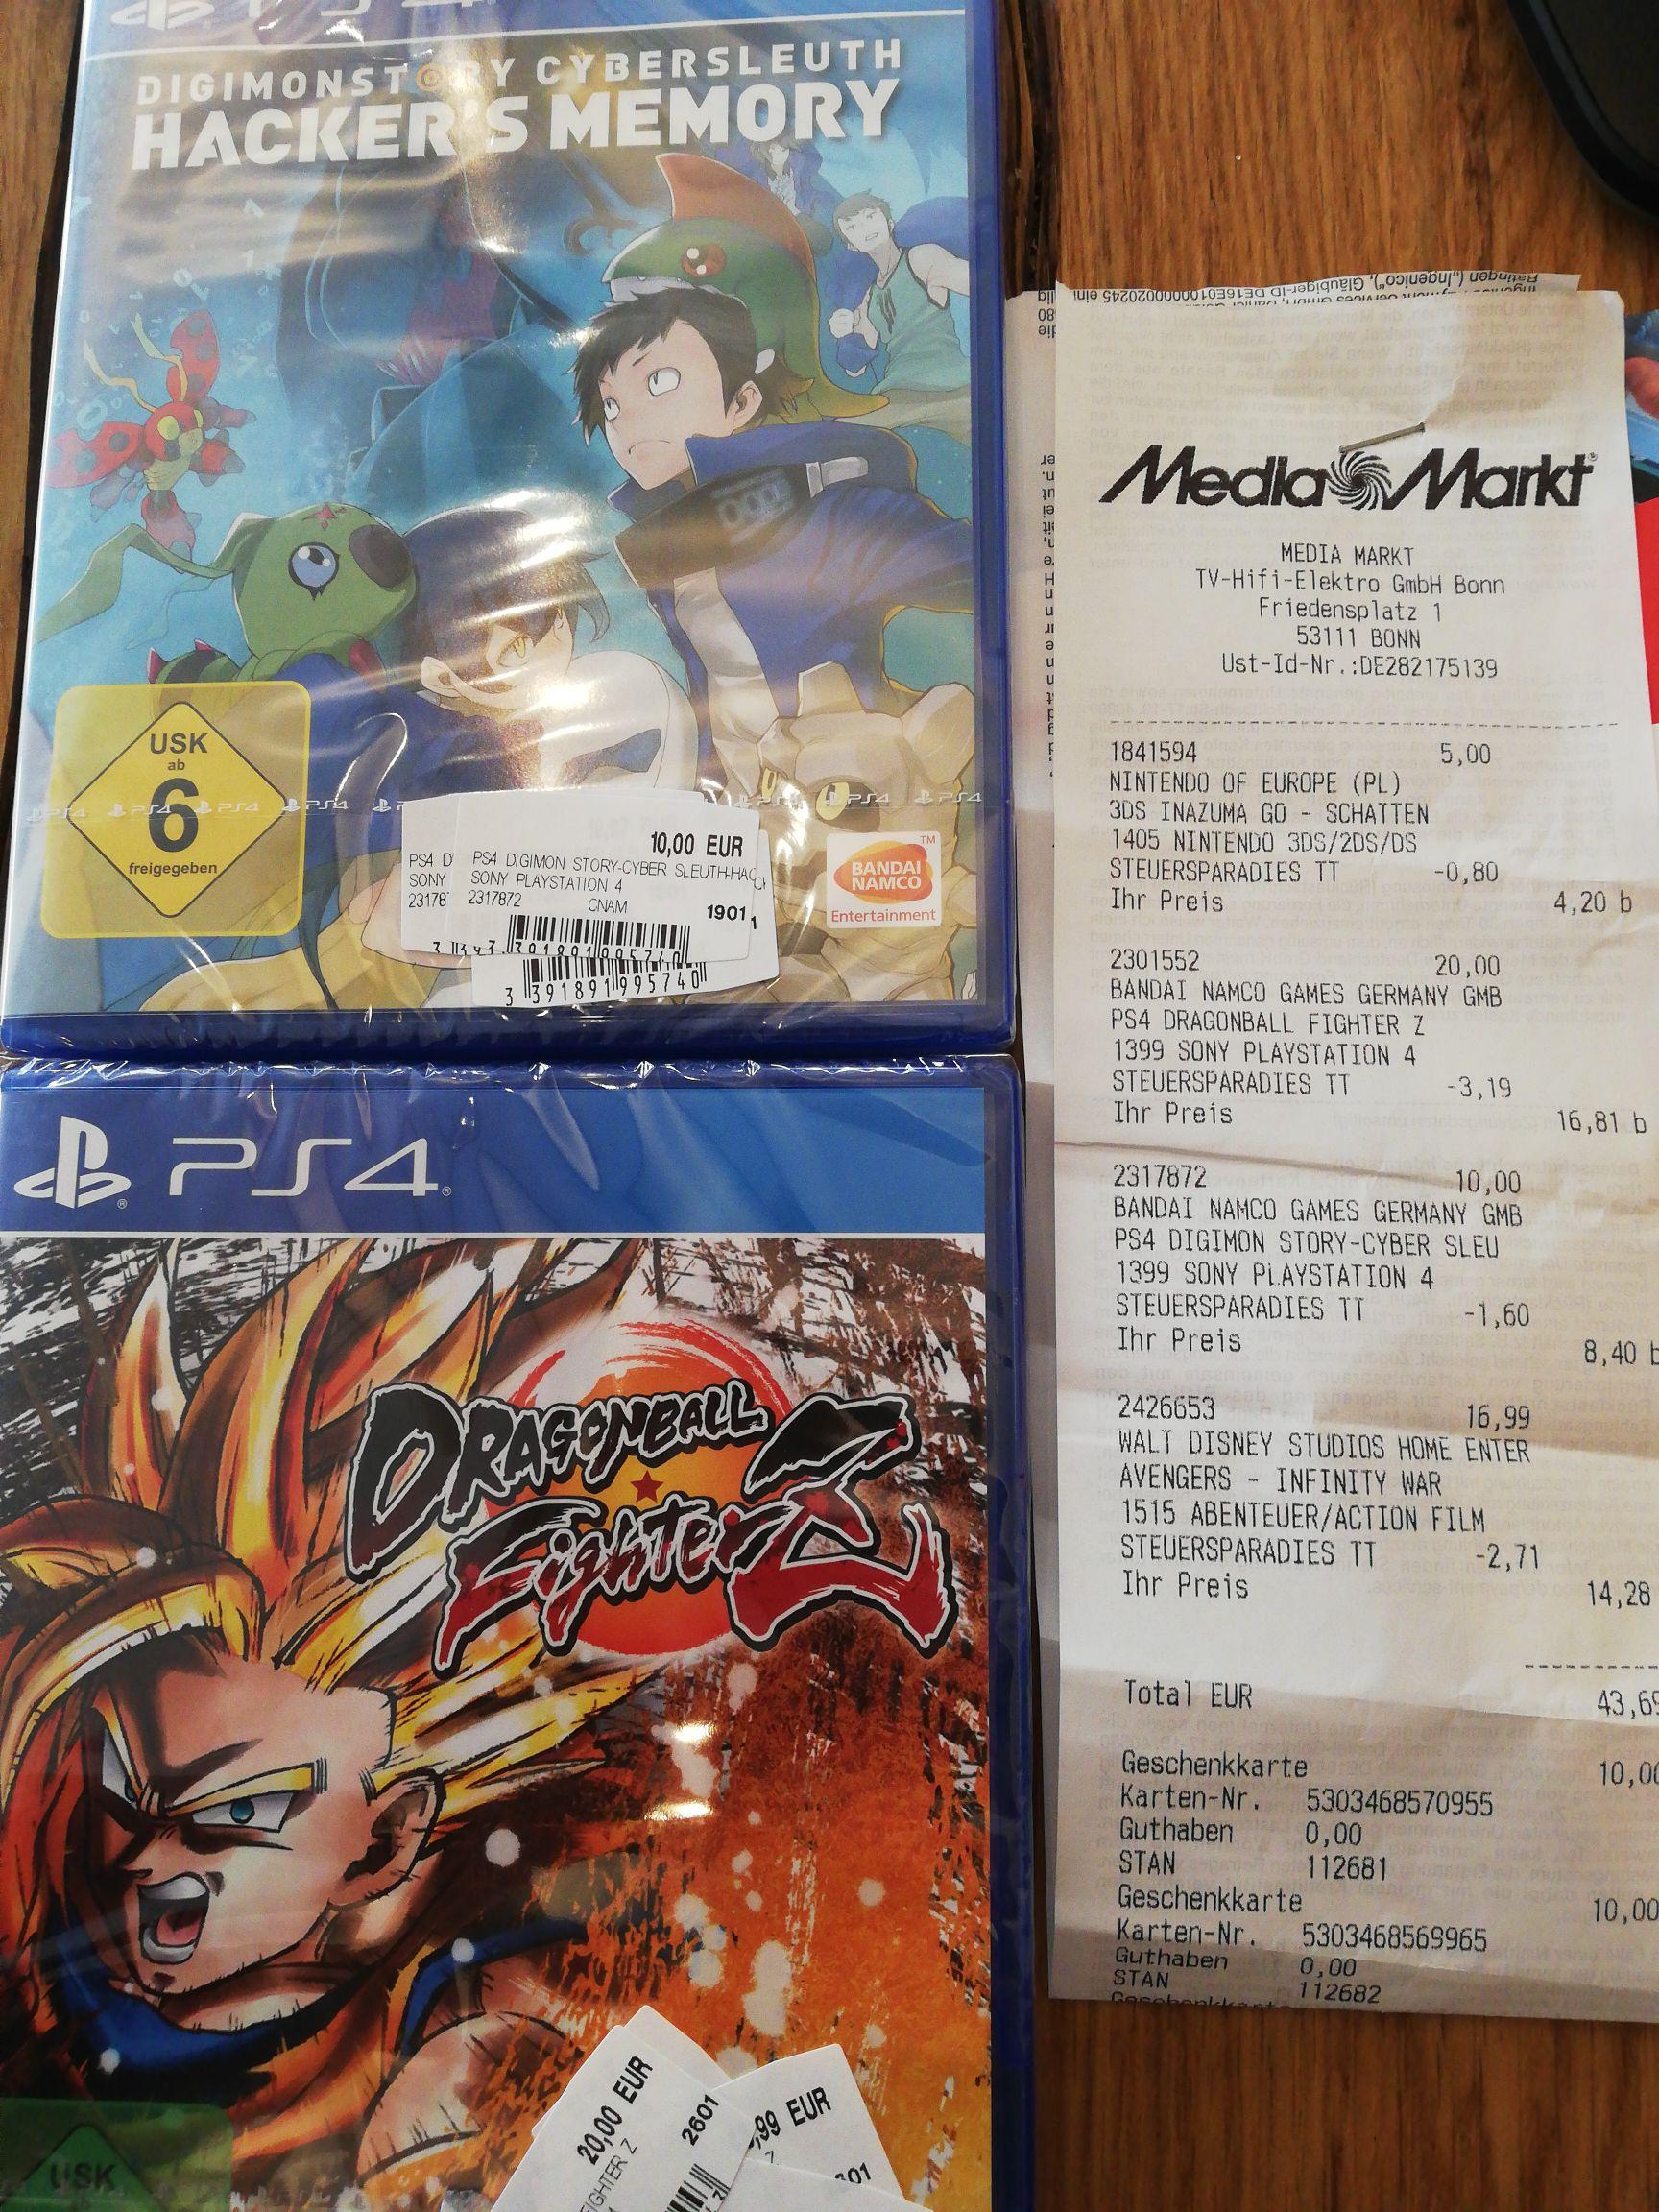 [Media Markt Bonn] DragonBall FighterZ 16,81€ PS4 & Digimon Cyber Sleuth 8,40€ PS4